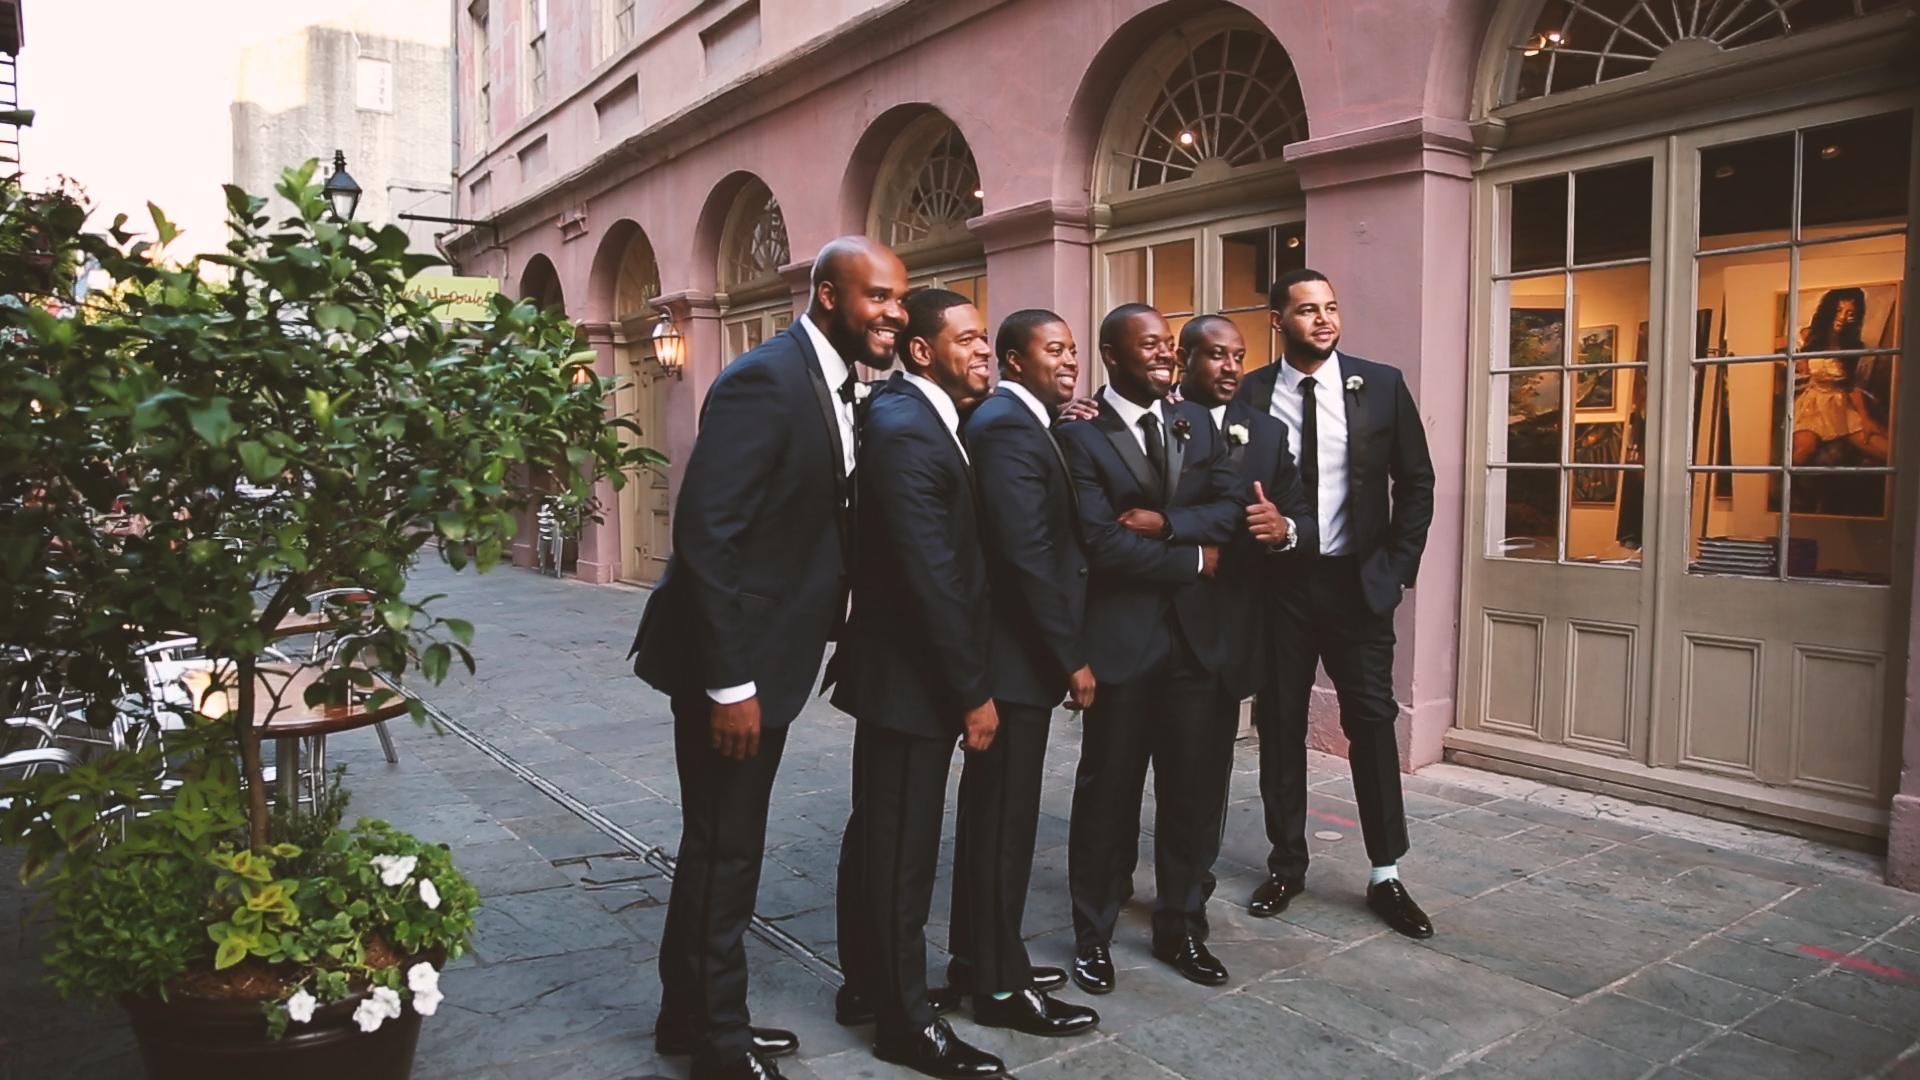 Sharp looking set of groomsmen!